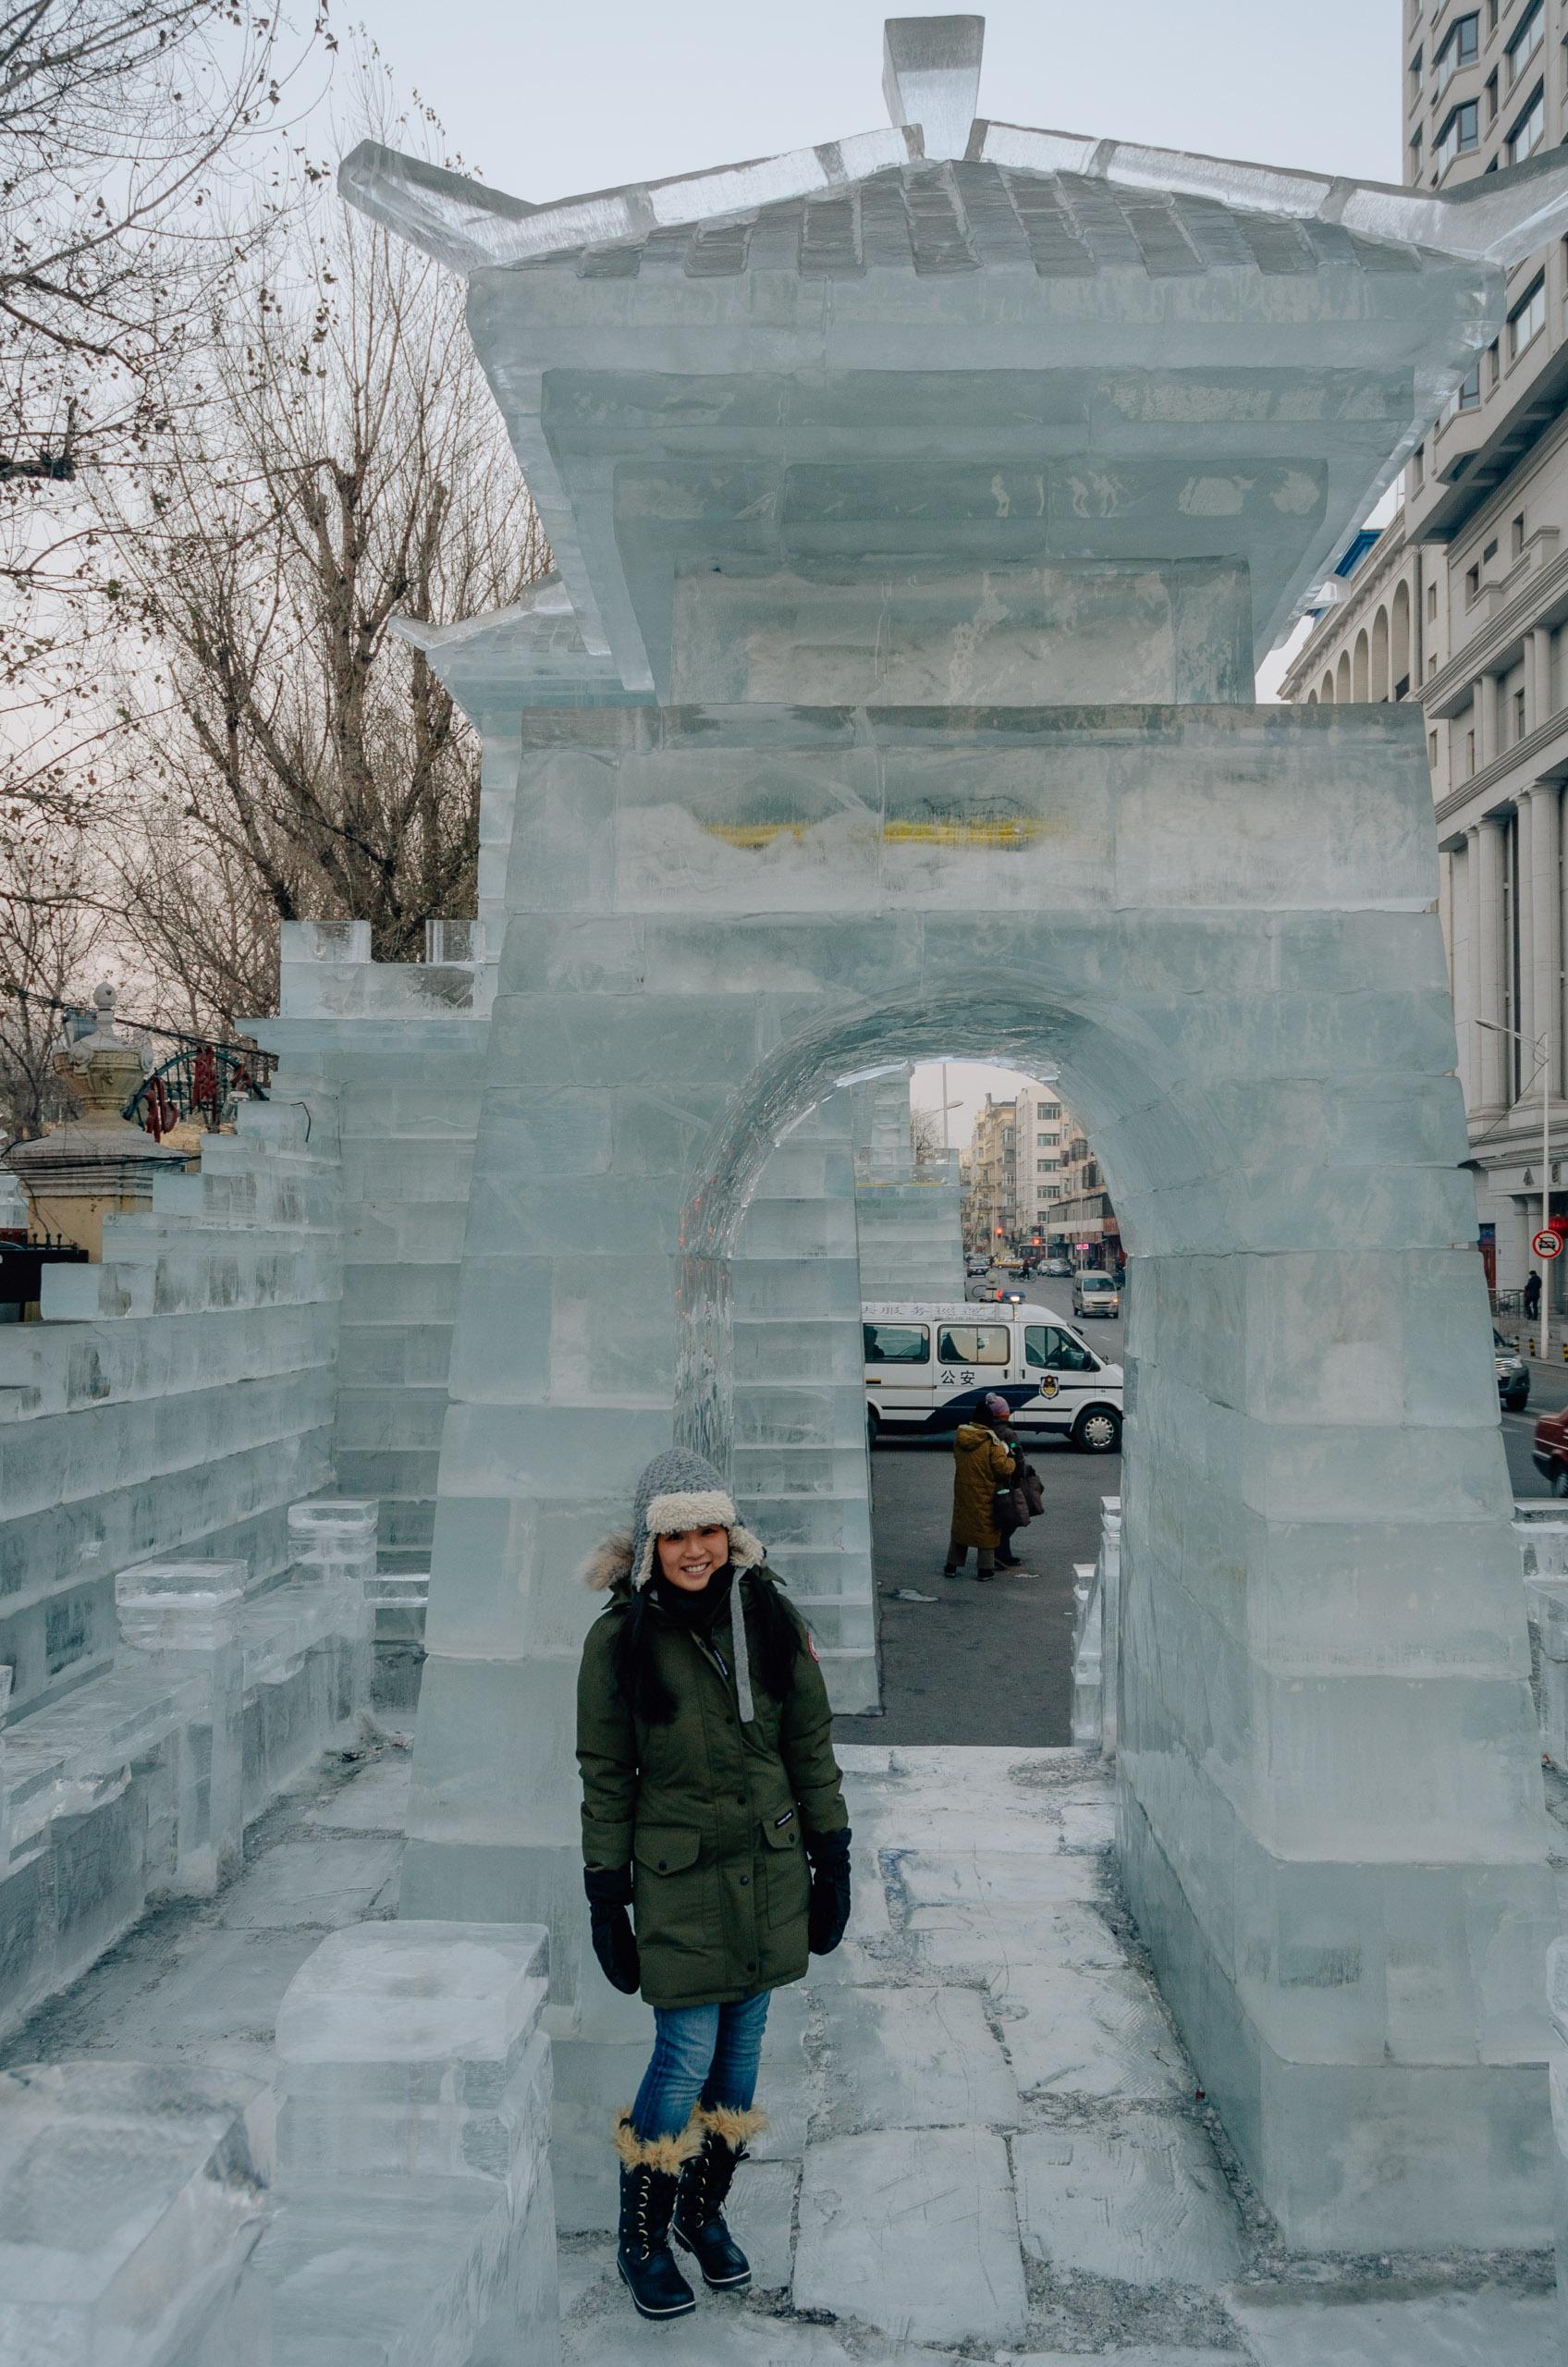 Harbin China Ice Festival - 2012-0108-DSC_1867_117243